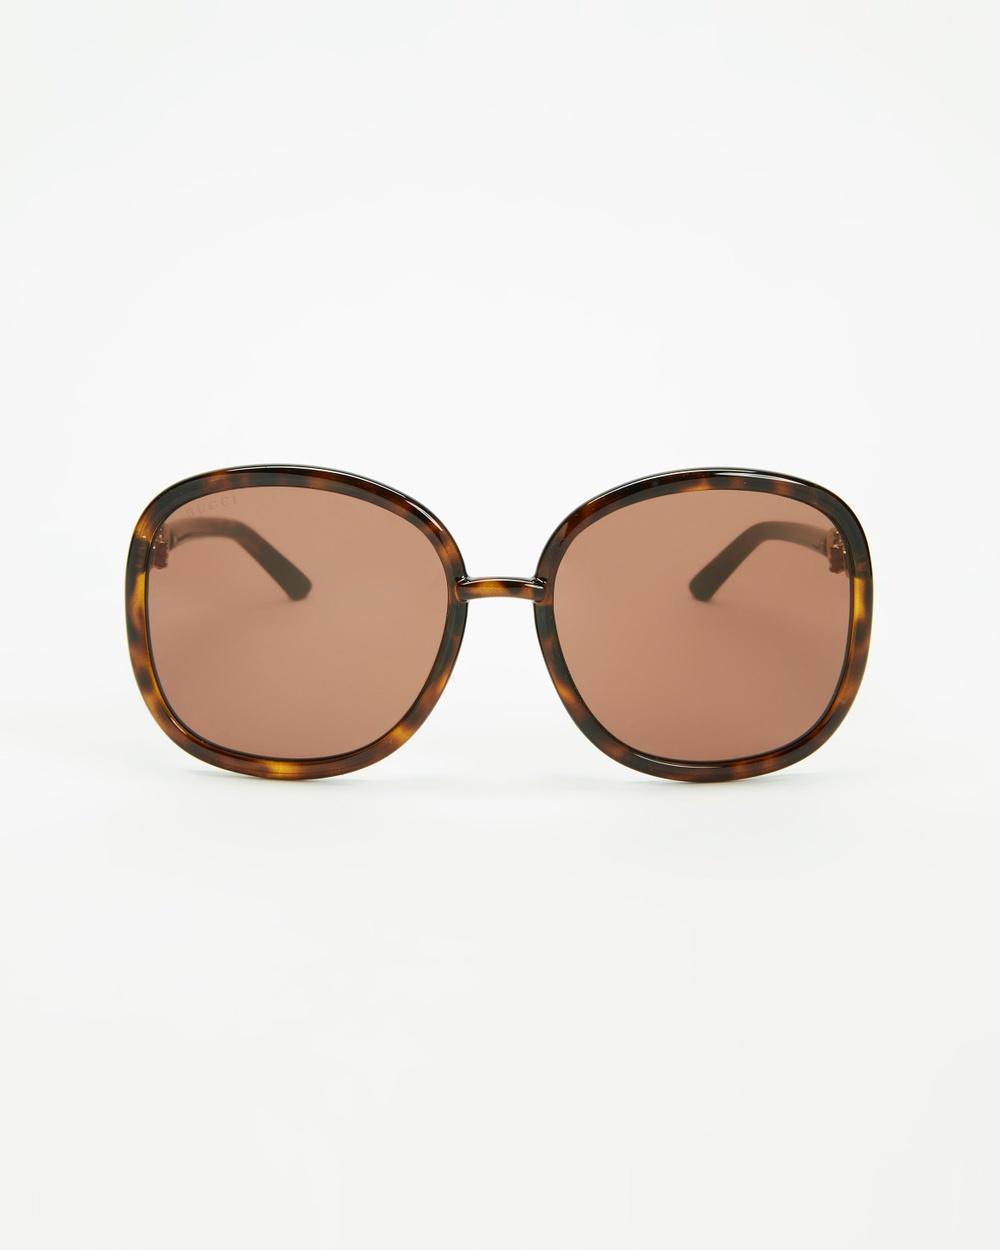 Gucci GG0892SA002 Sunglasses Havana